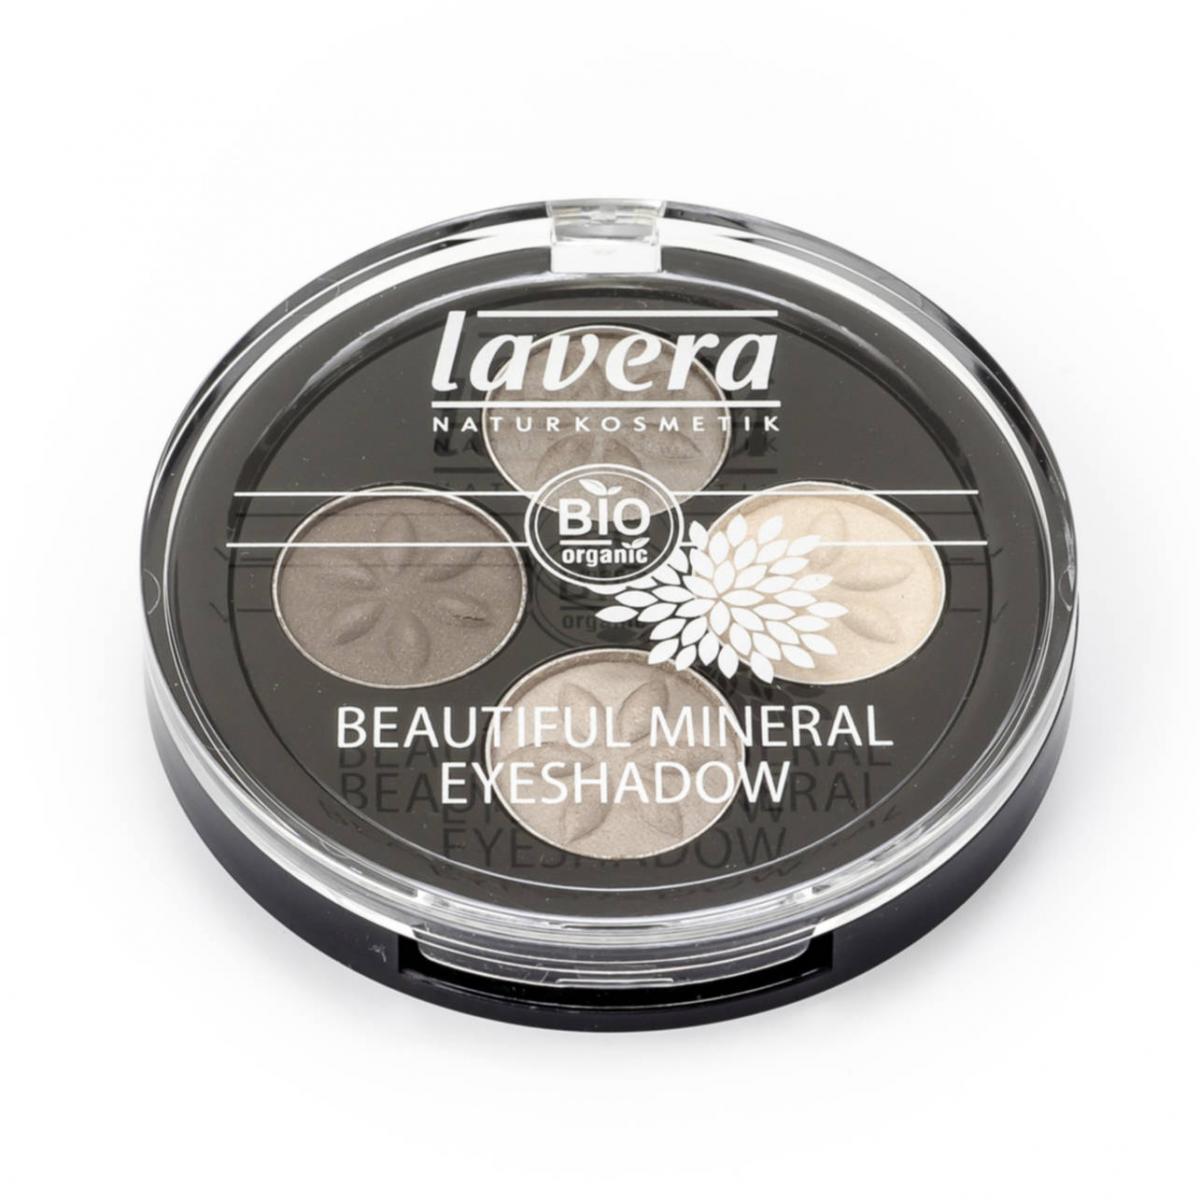 Beautiful Mineral Eyeshadow Quattro Dose 4 g - Lavera